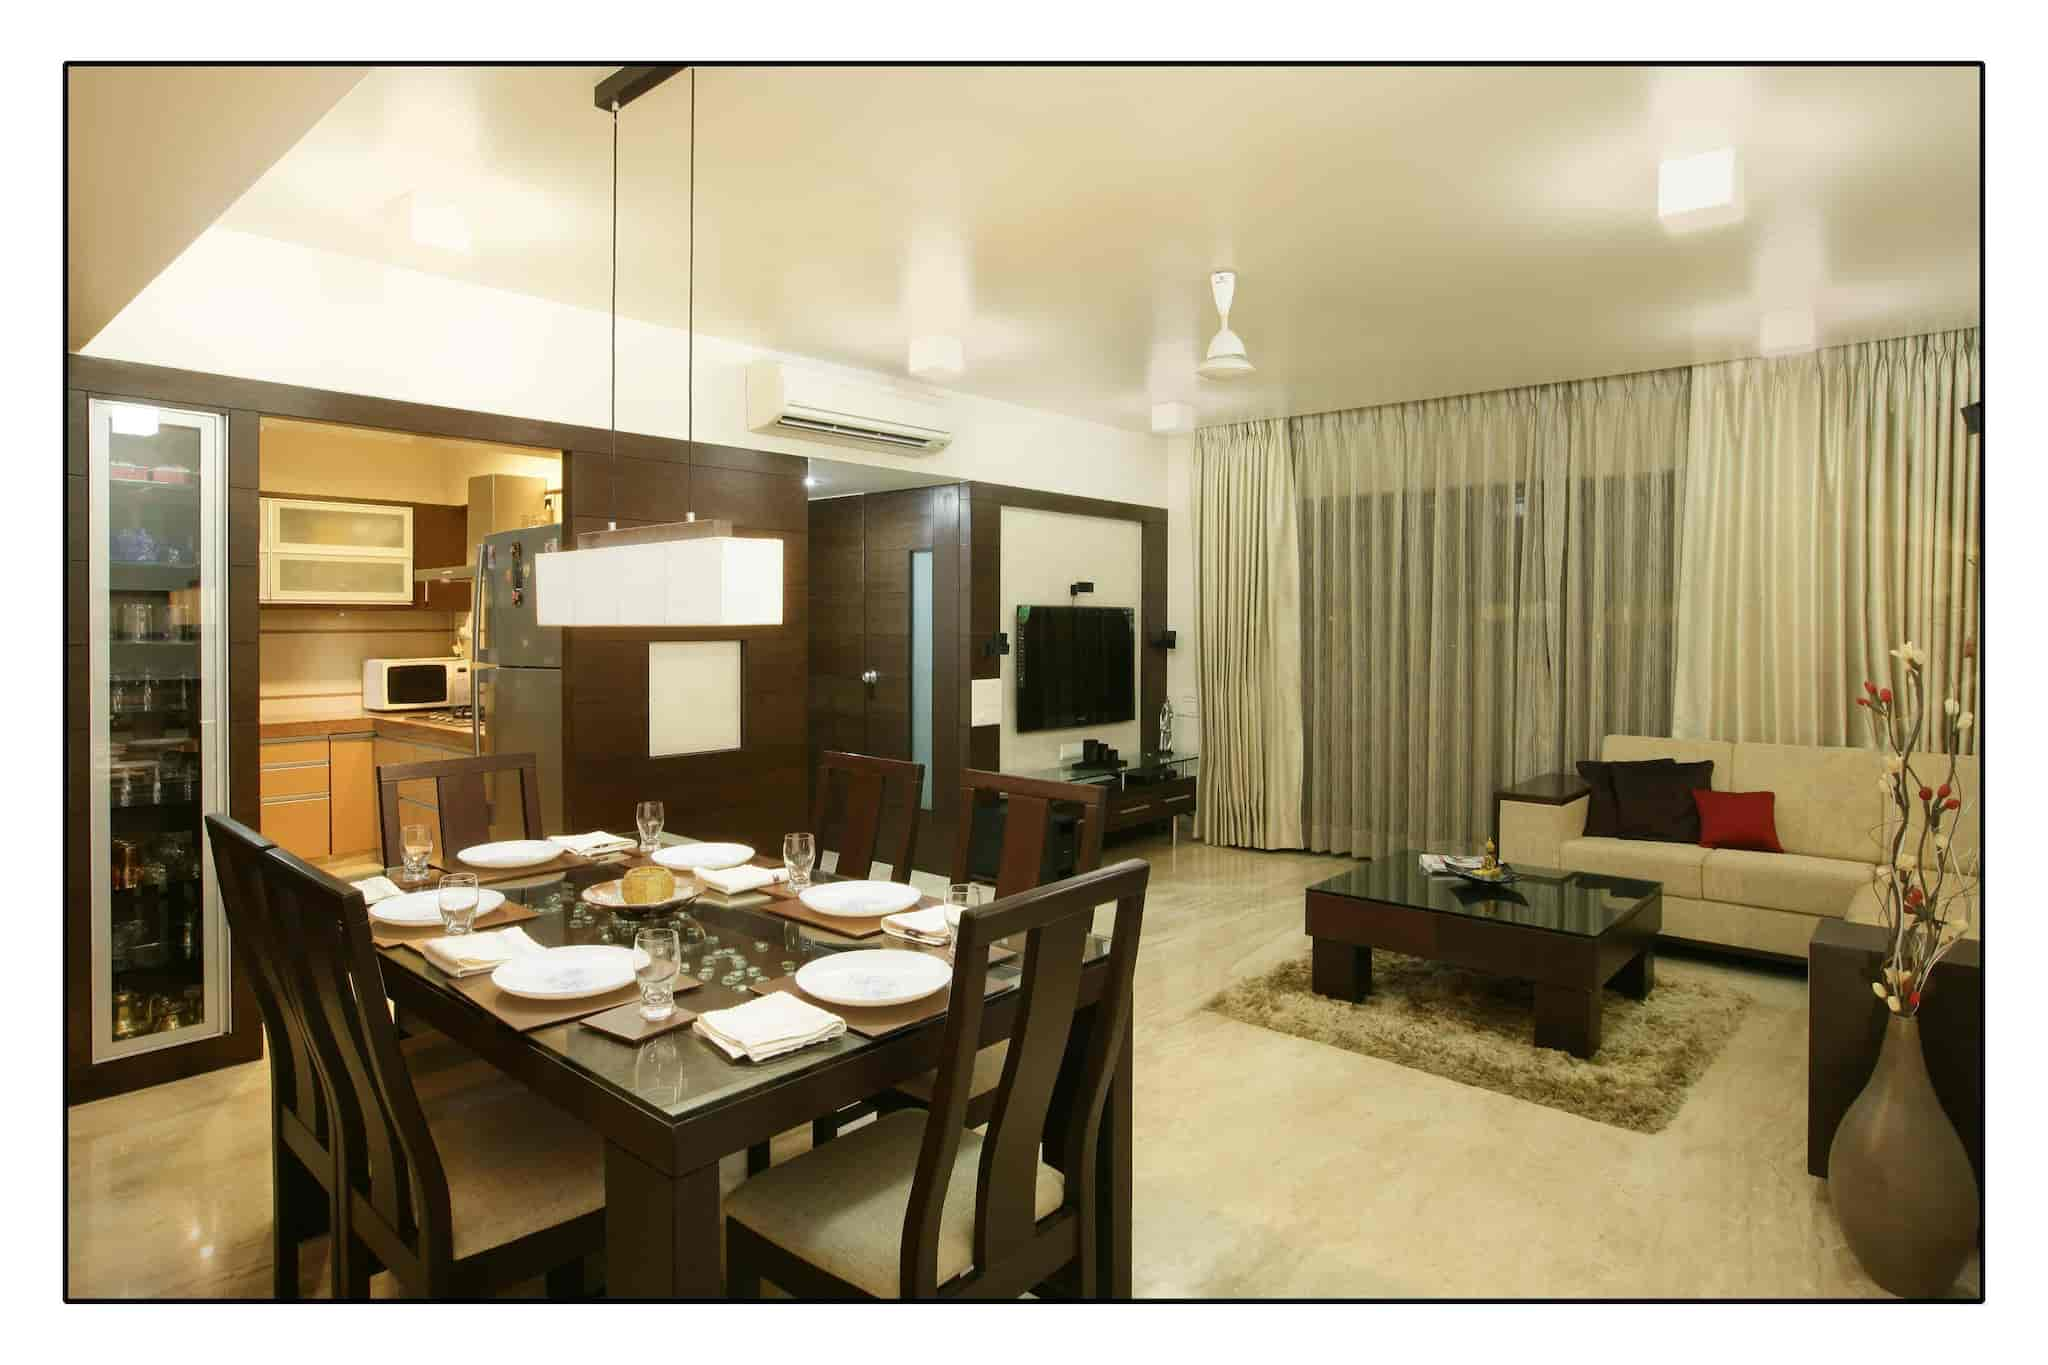 Space Design House Gulbai Tekra Interior Designers In Ahmedabad Justdial